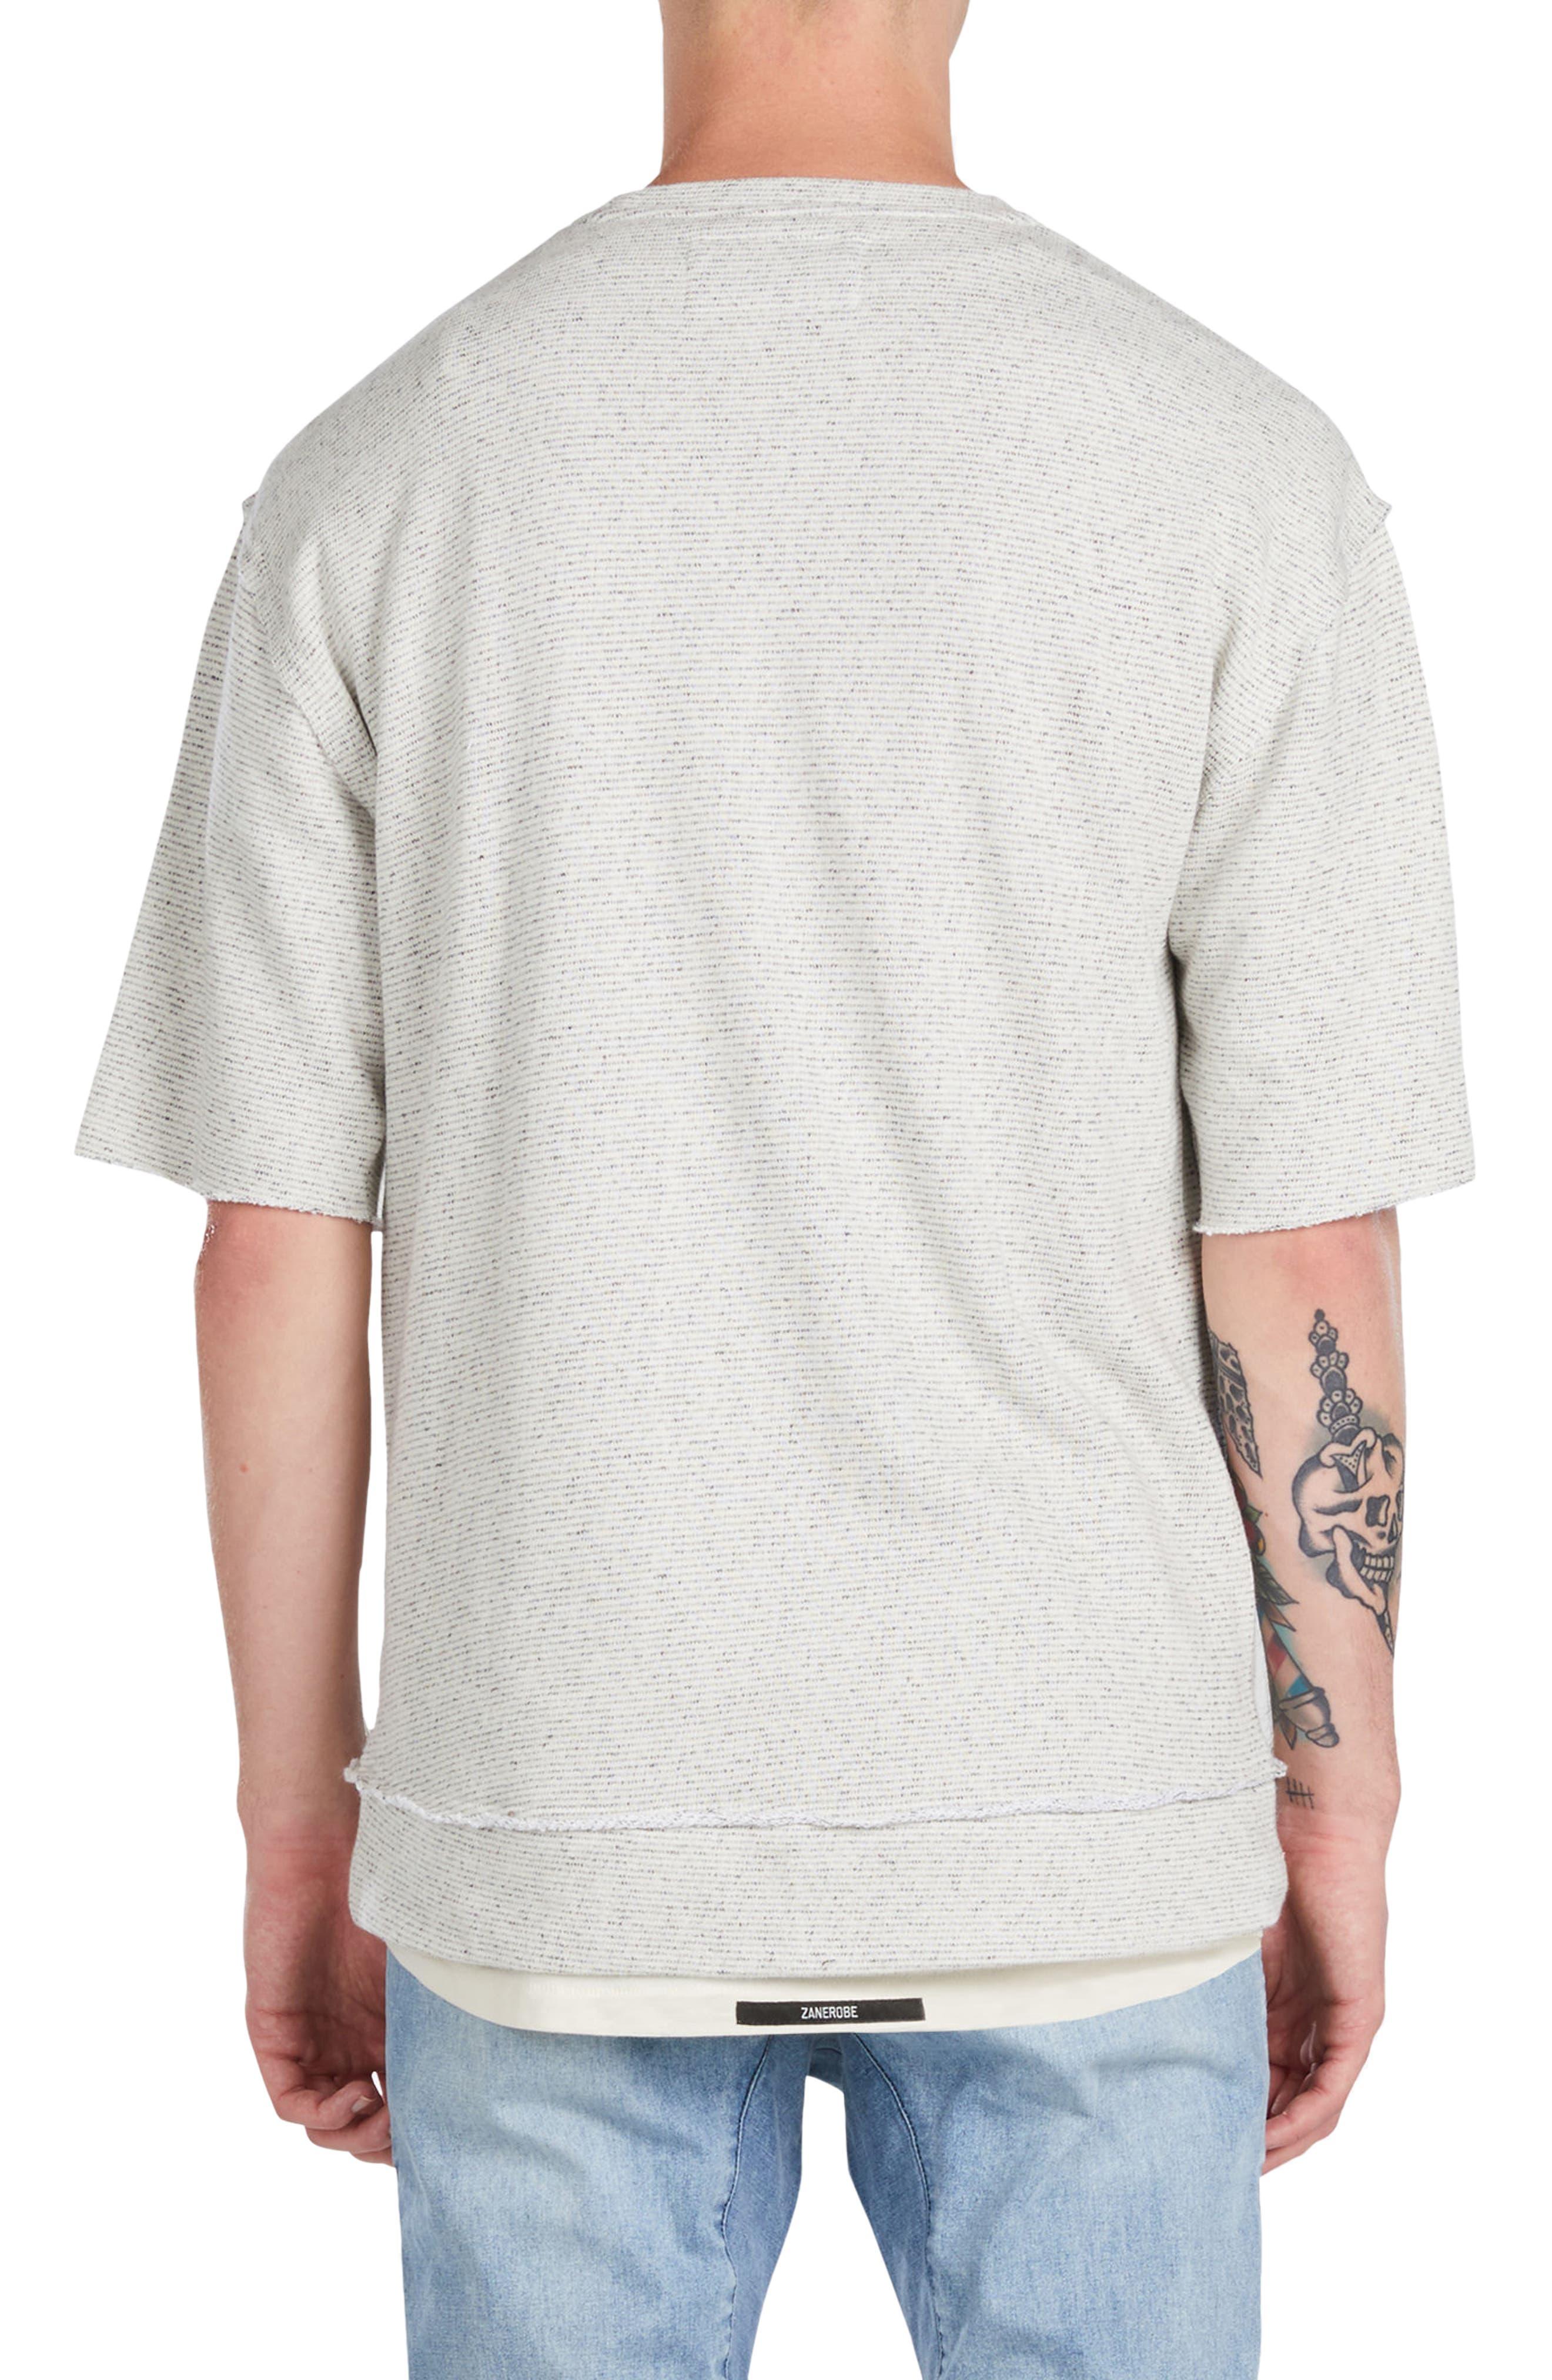 Rugger Oversize Half Sleeve Sweatshirt,                             Alternate thumbnail 2, color,                             251